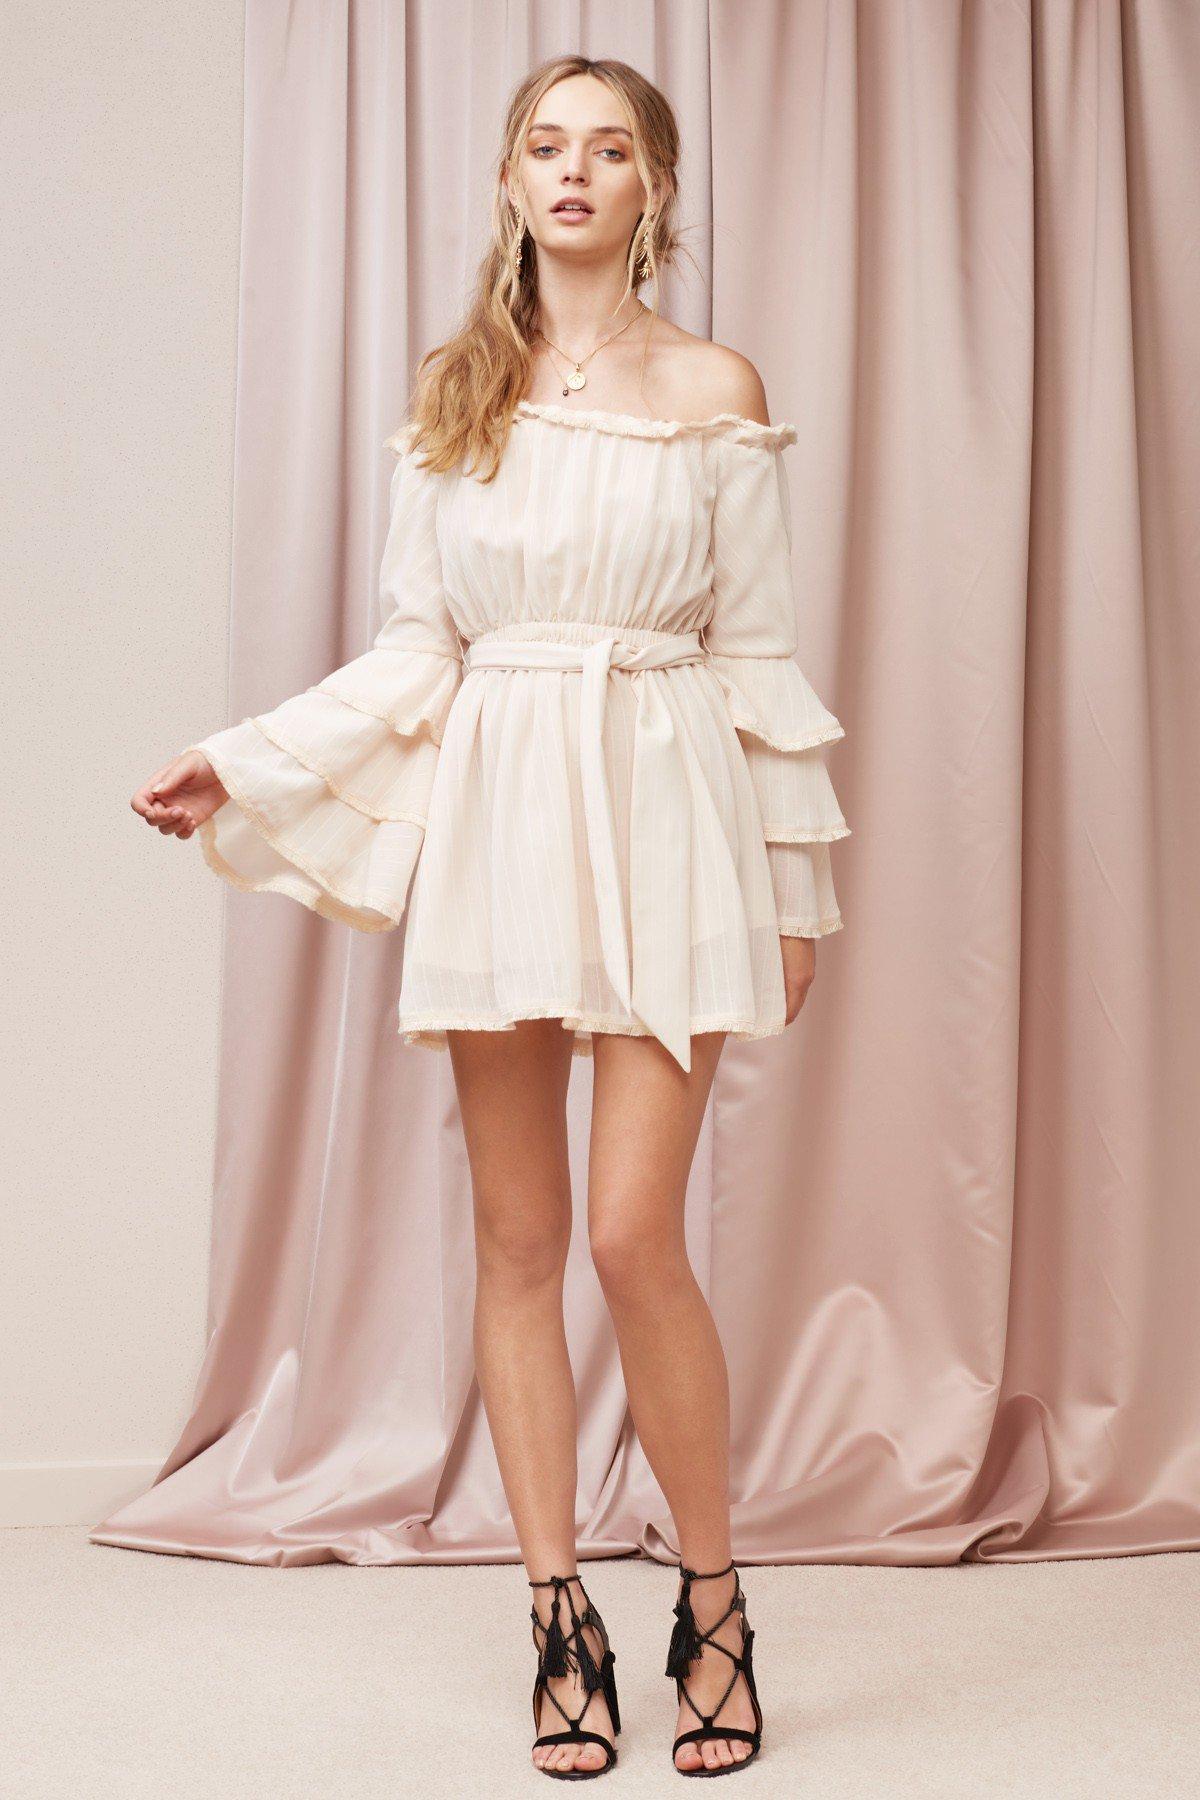 Shop Finders Keepers Alive Dress.